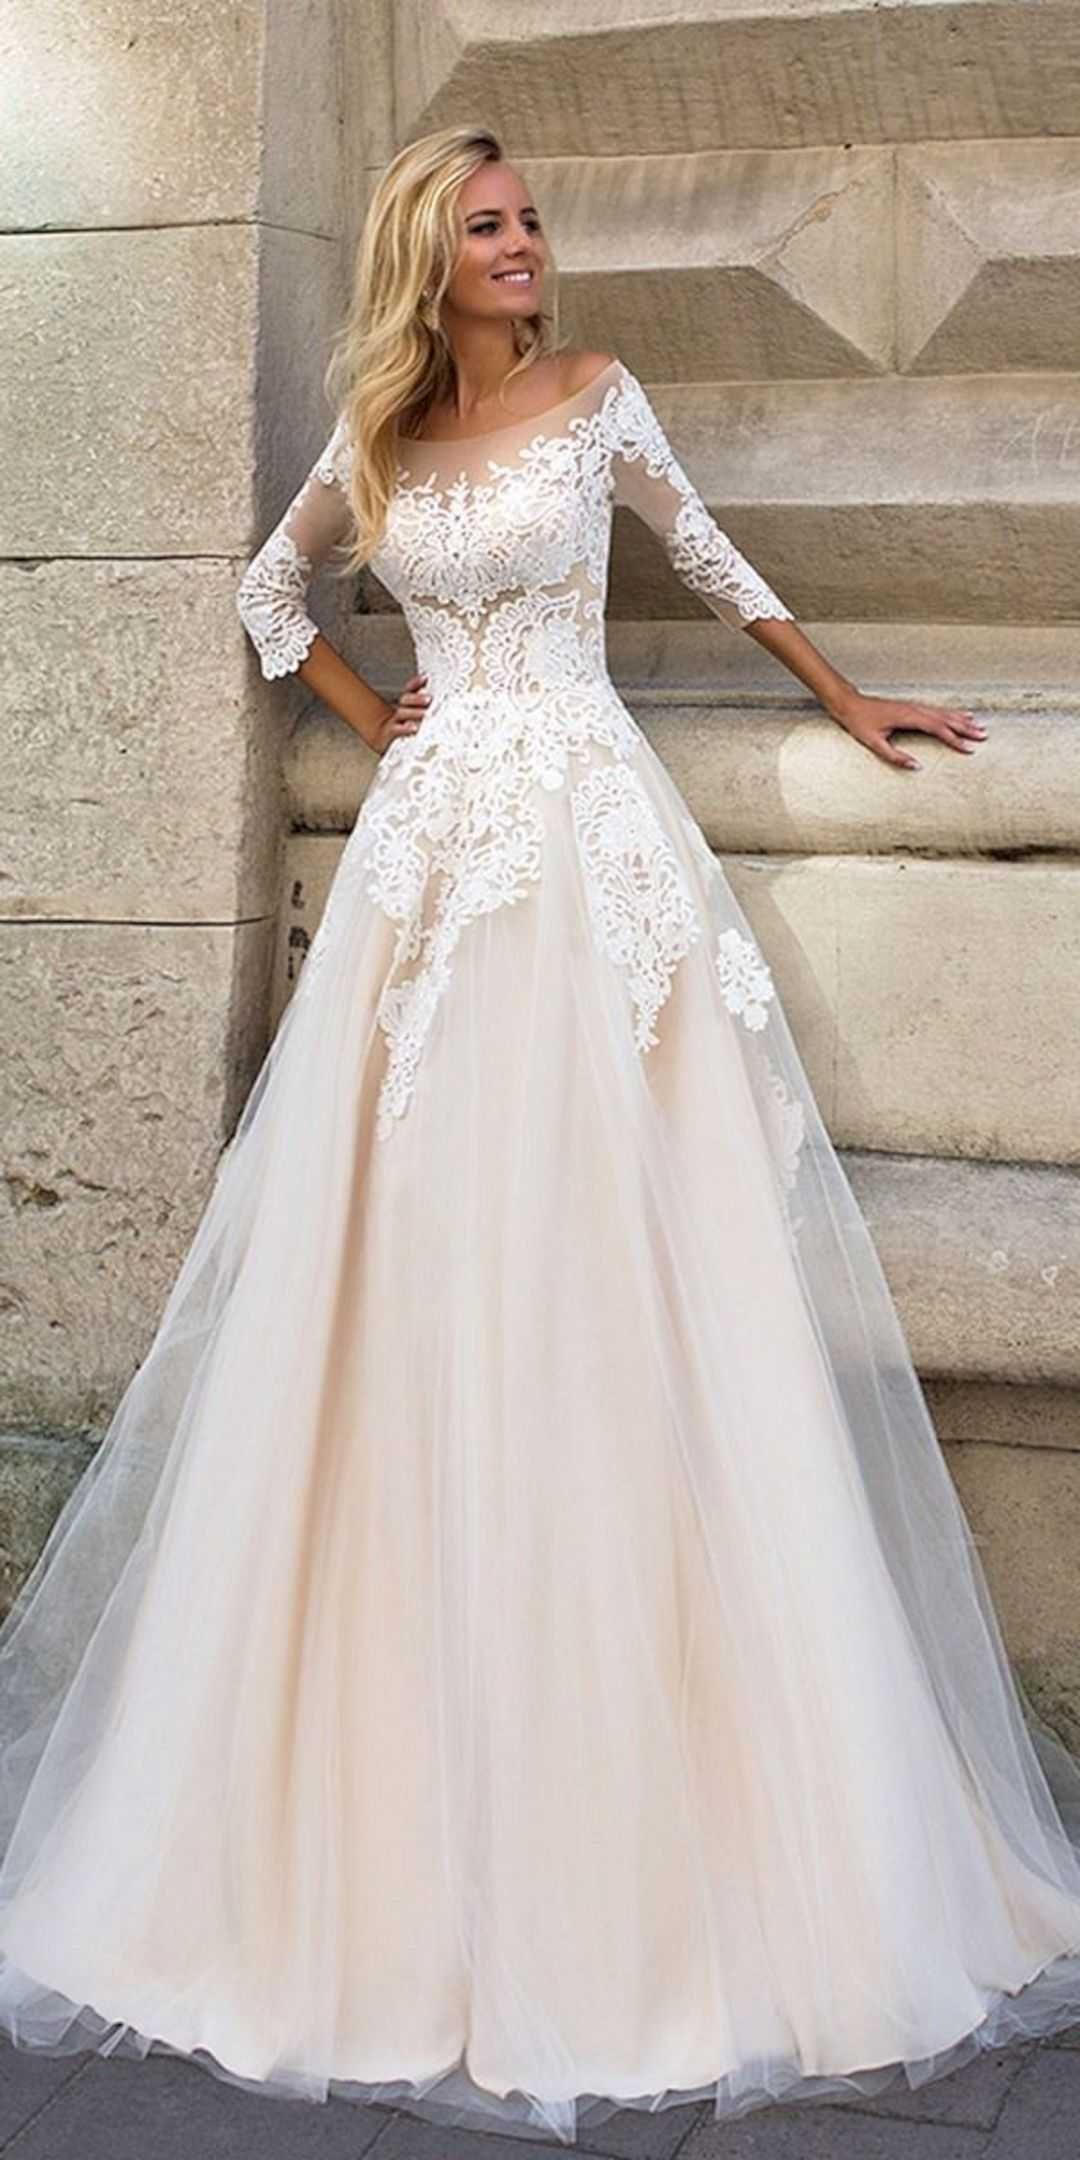 Lovely Wedding Dresses wholesale In Turkey Wedding Pinterest